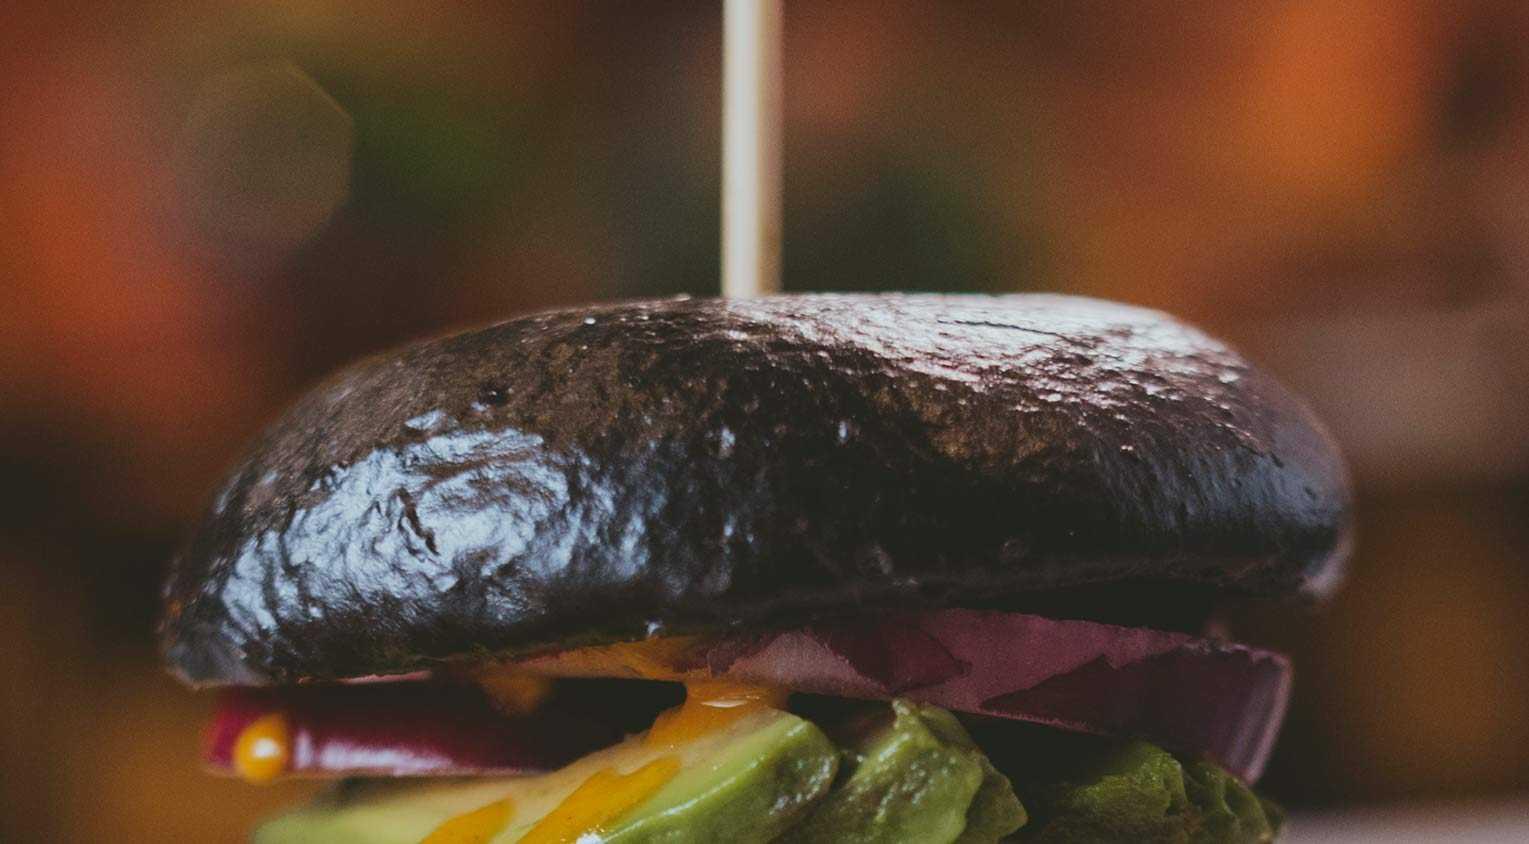 Receta de Pan de Hamburguesa con Tinta de Calamar